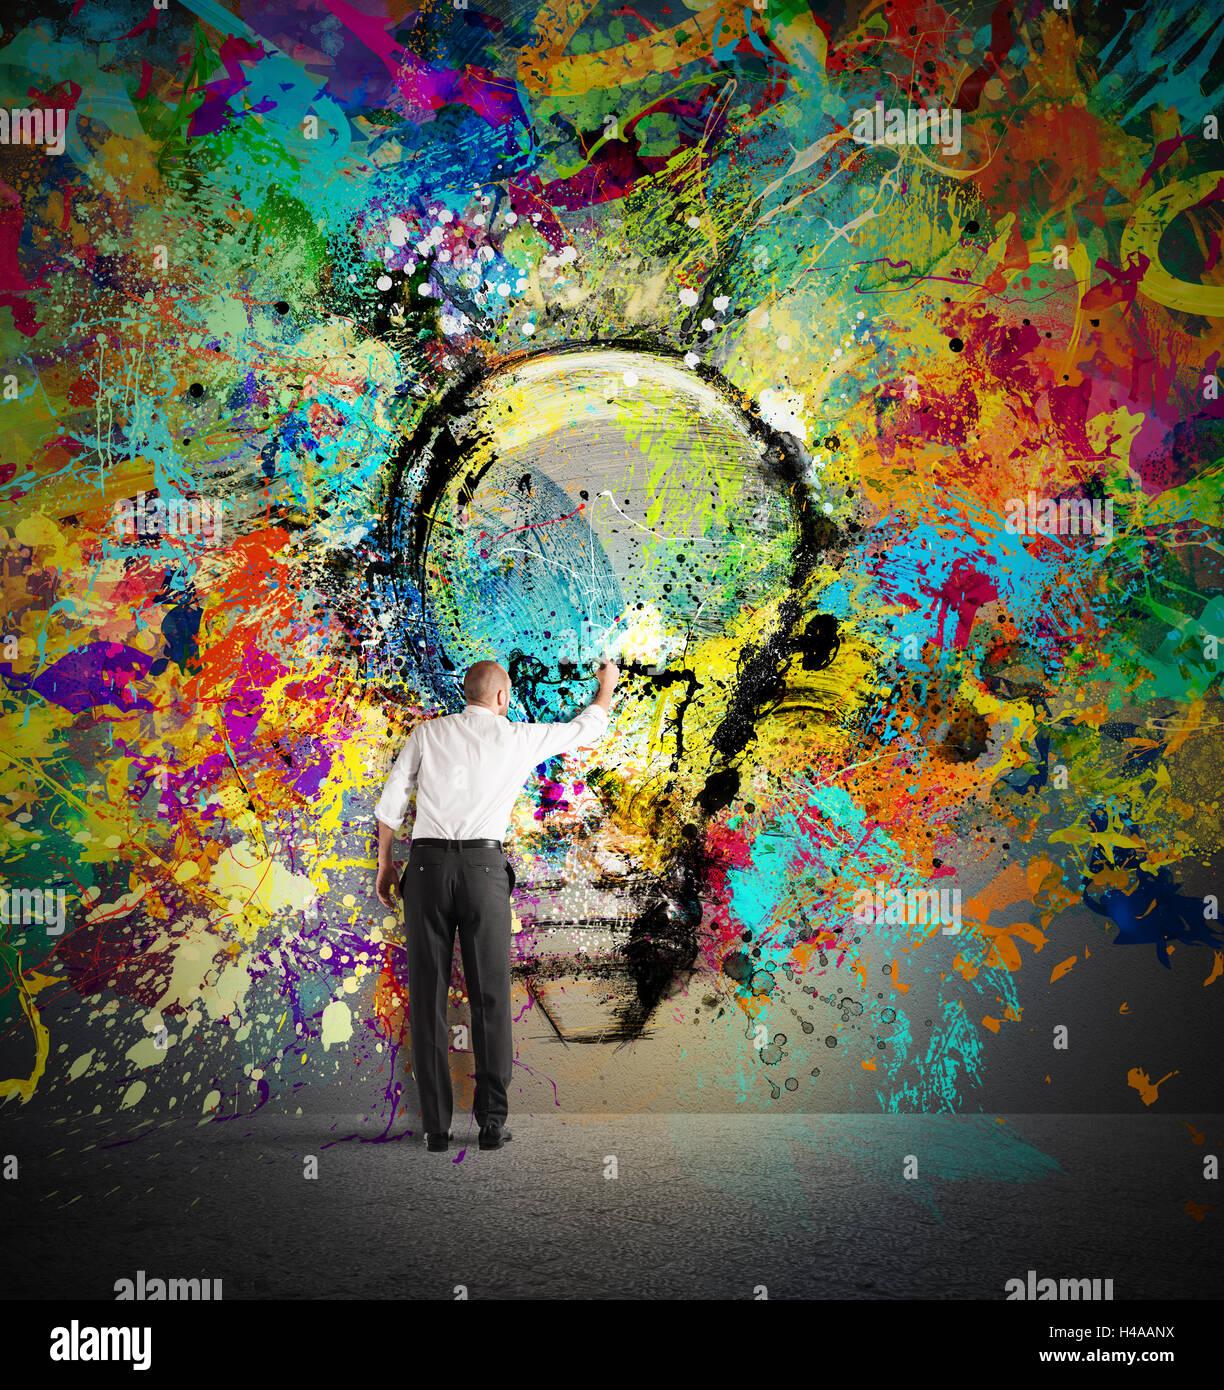 Paint a creative idea - Stock Image